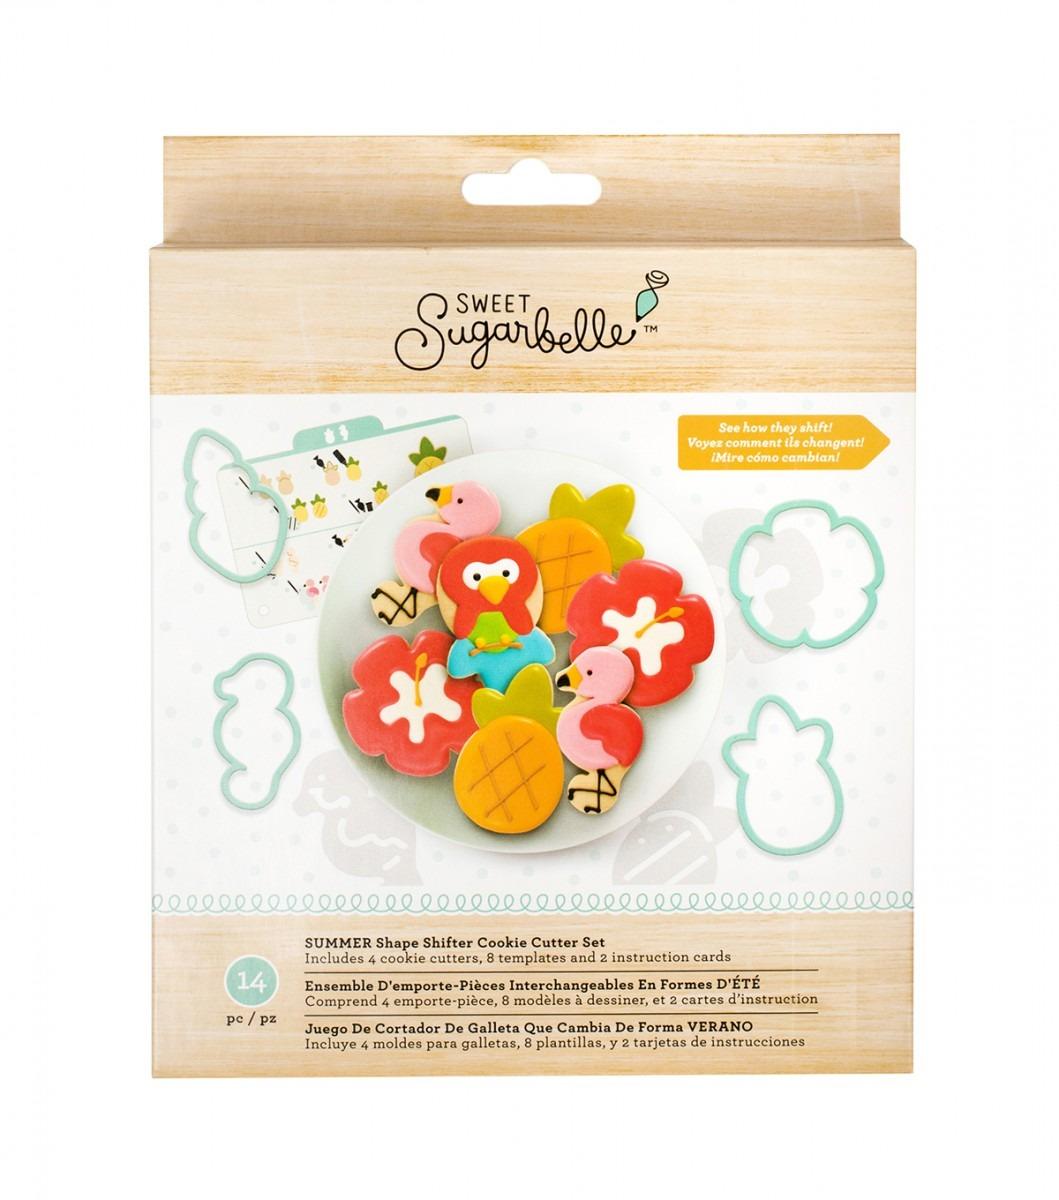 Sweet Sugarbelle Summer Shape Shifter Cookie Cutter Set